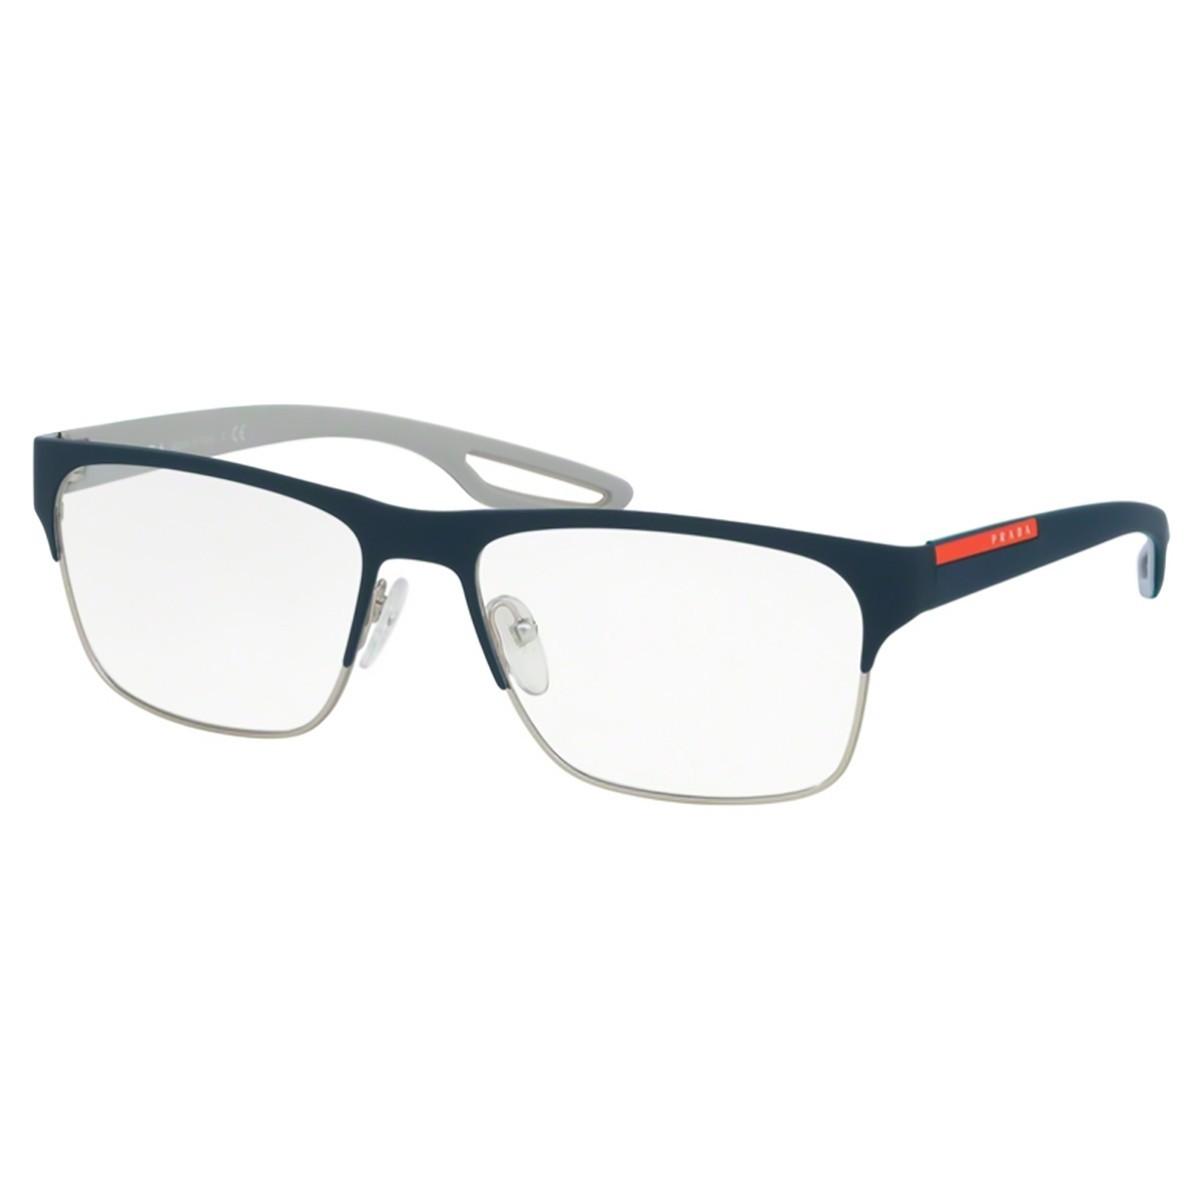 PRADA VPS52G - Azul/Prata - UR5-1O1 57-17 140